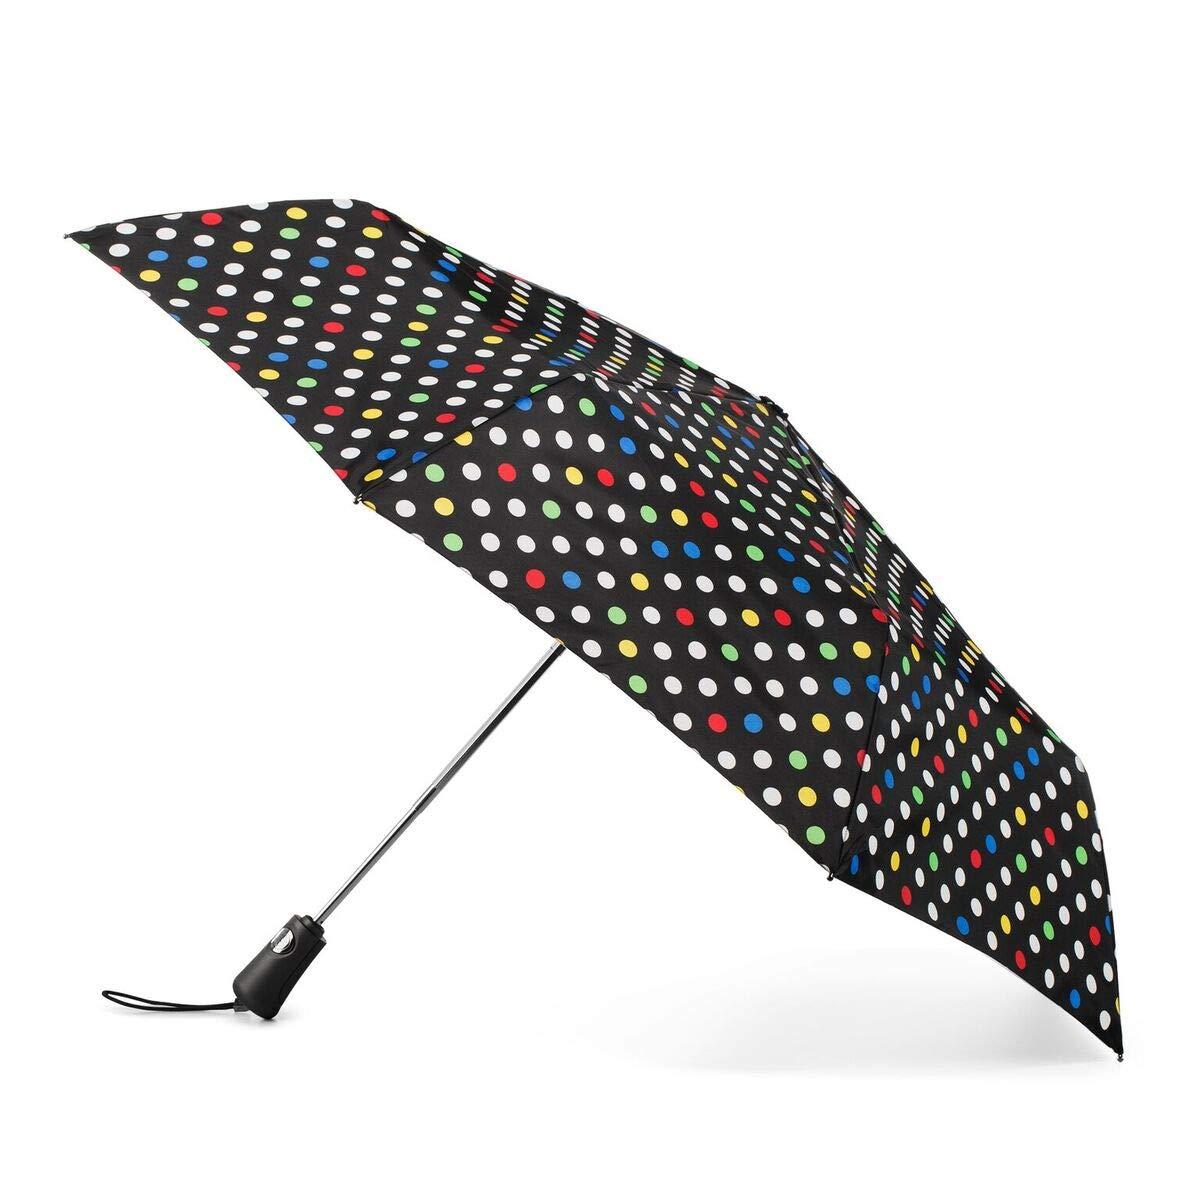 Titan Compact Travel Umbrella -UV Sun Protection, Windproof, Waterproof, Auto Open/Close